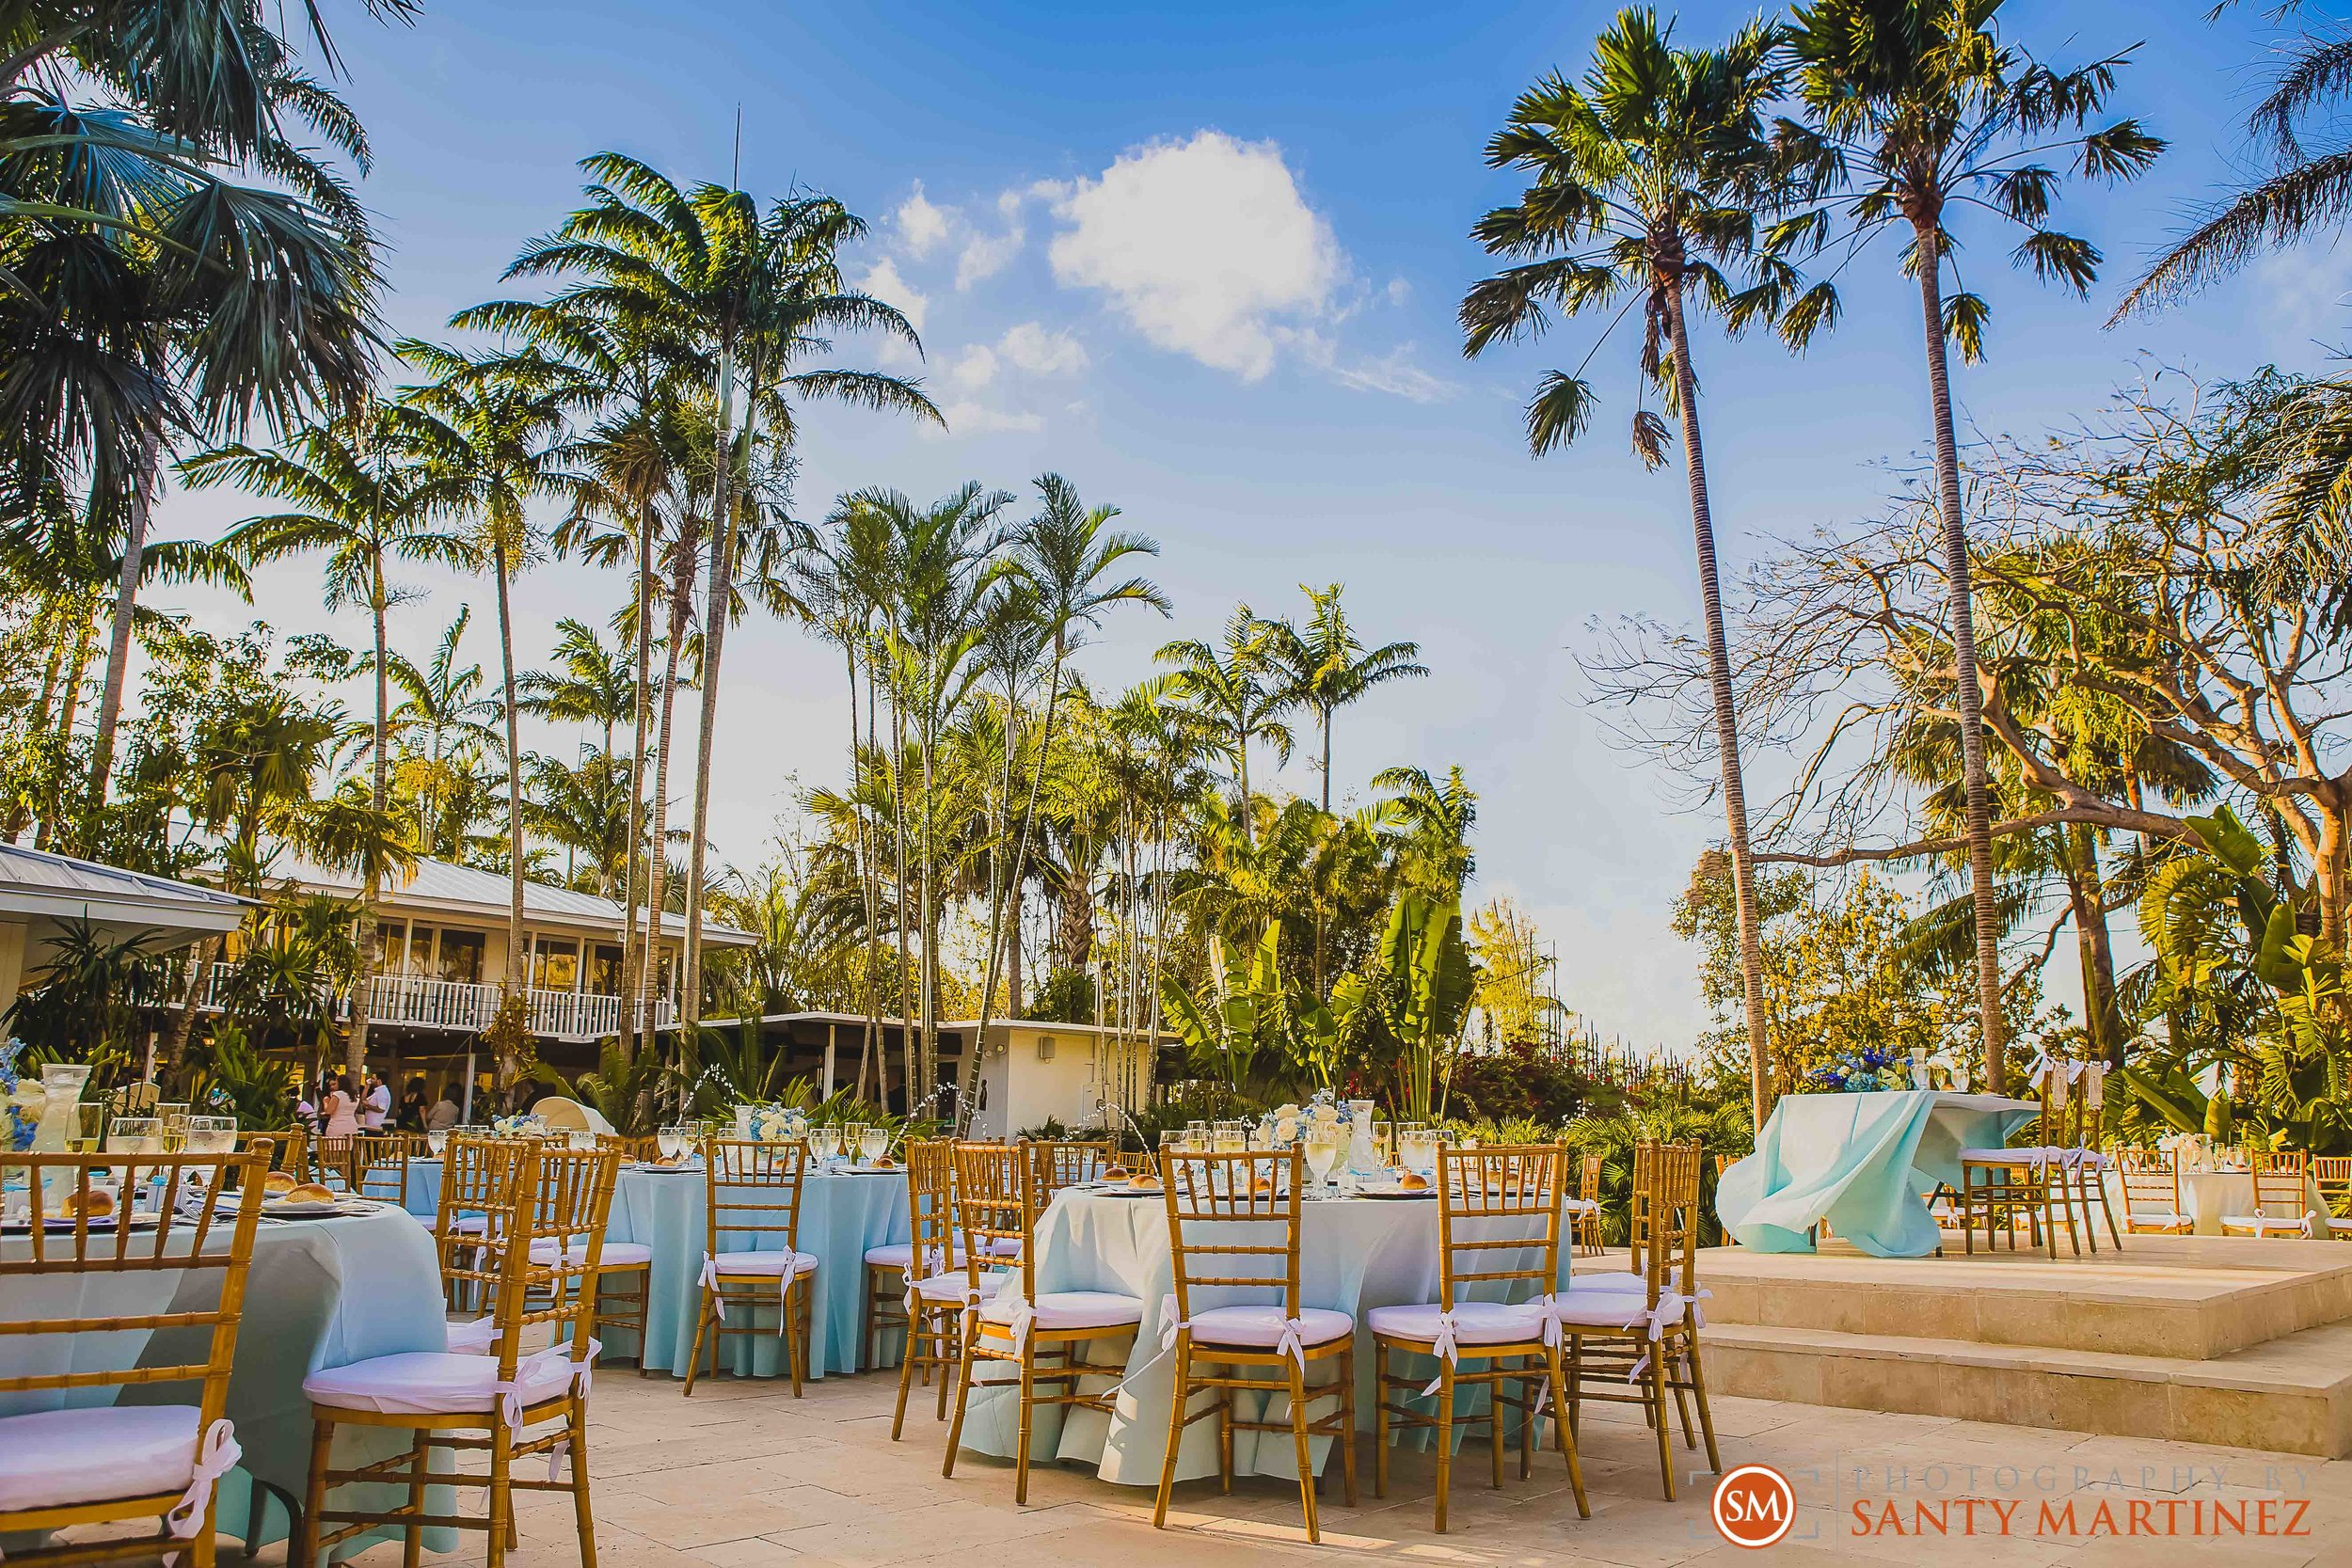 Wedding - Whimsical key West House - Photography by Santy Martinez-27.jpg